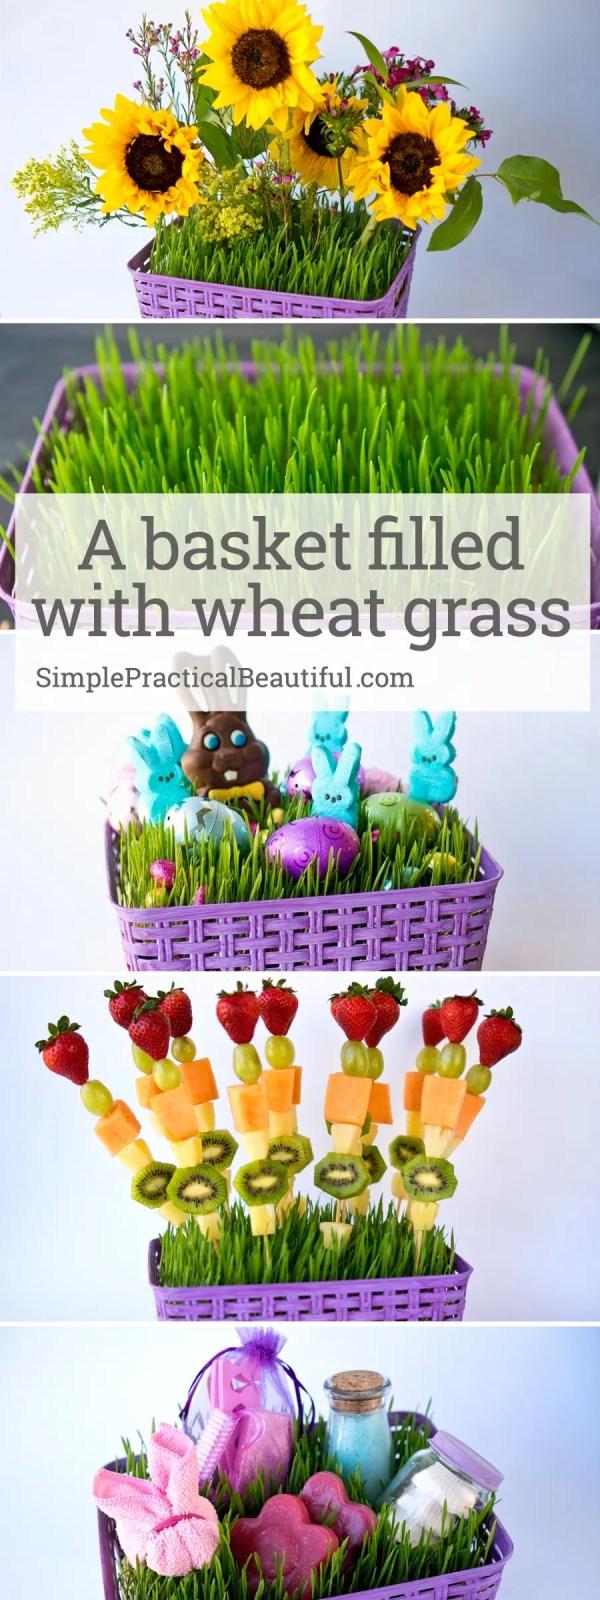 Make a beautiful DIY basket for Easter filled with living grass | centerpiece idea | brunch fruit recipe | Easter basket idea | grow wheat grass